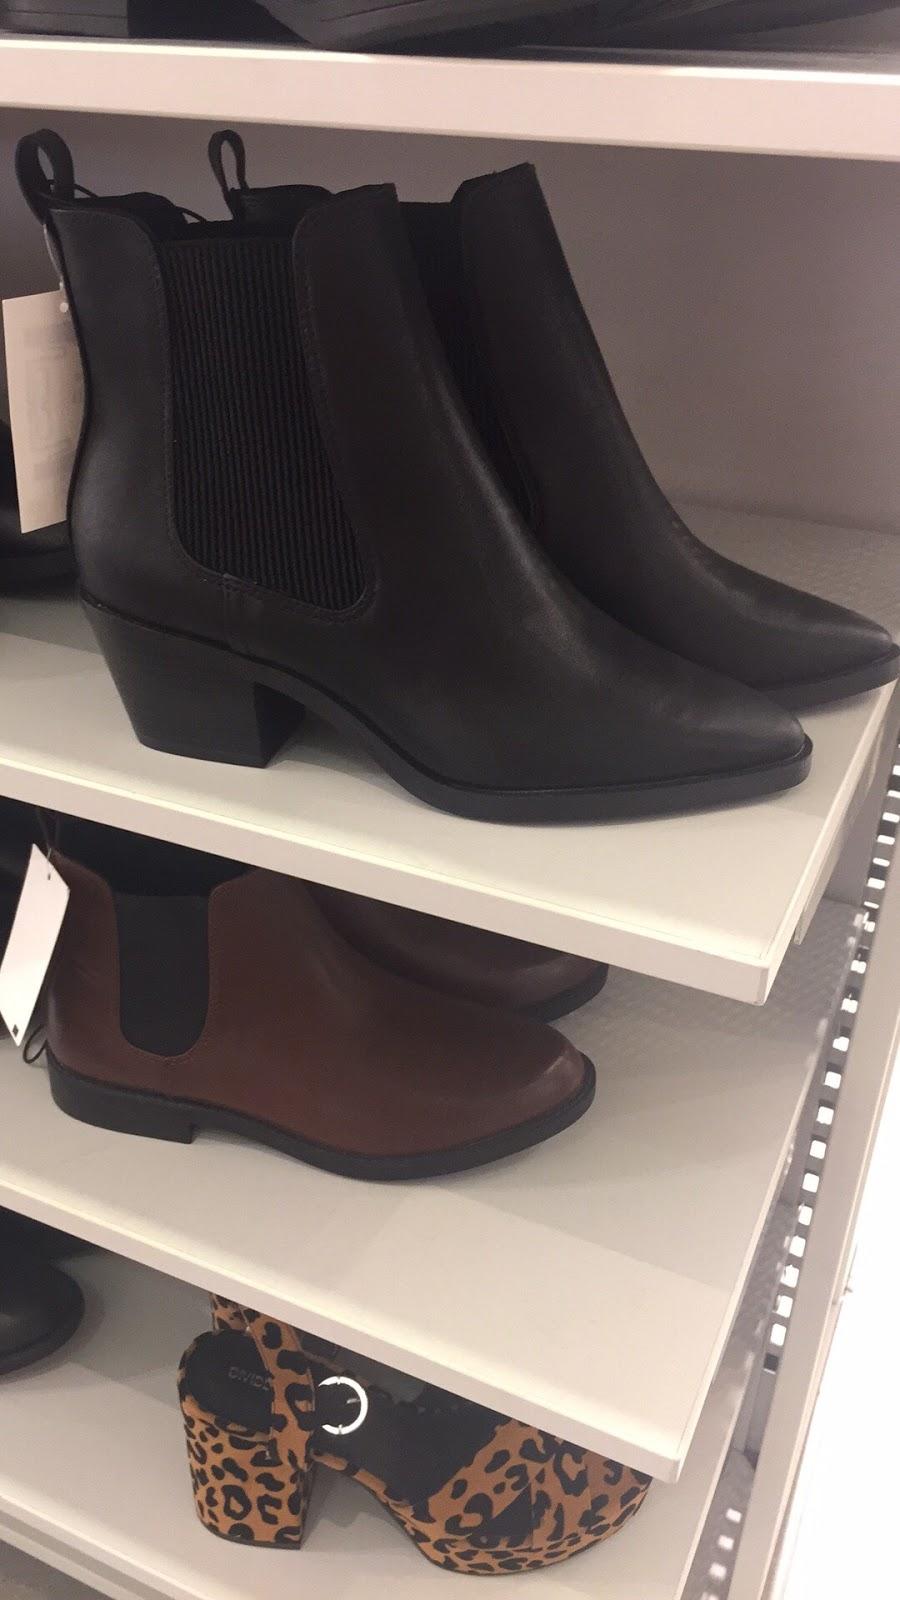 H&M - clothing store  | Photo 8 of 10 | Address: 1600 Water St, Laredo, TX 78040, USA | Phone: (855) 466-7467